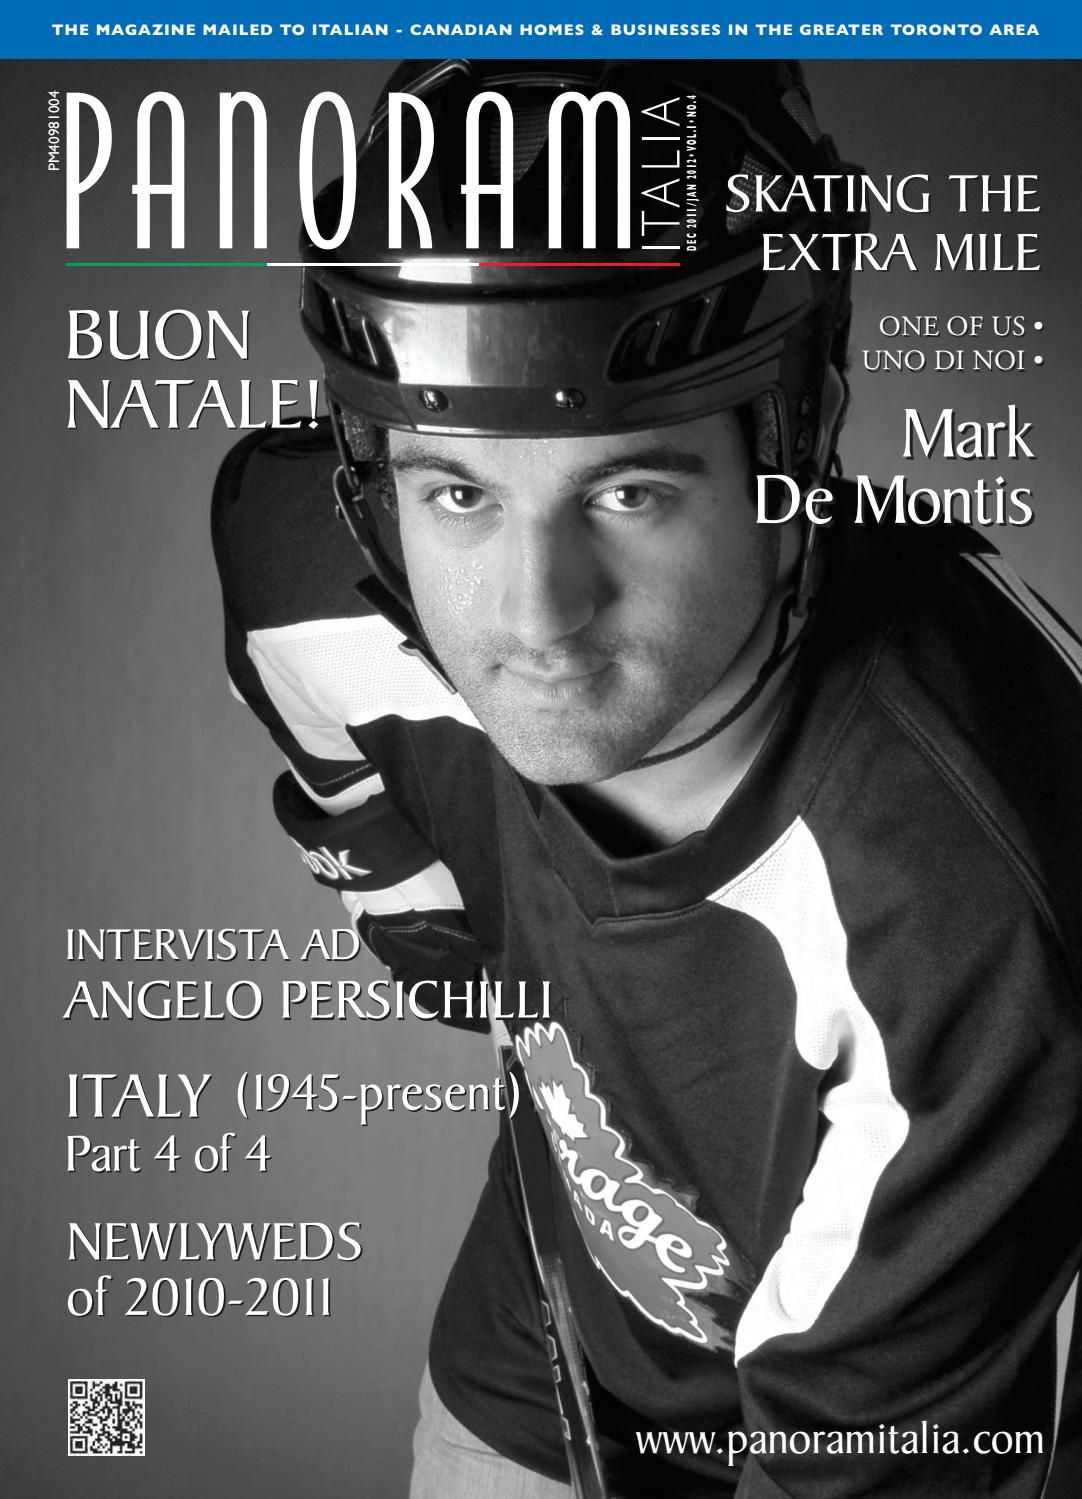 Decorazioni Natalizie Low Cost toronto vol.1 no.4 by panoram italia magazine - issuu